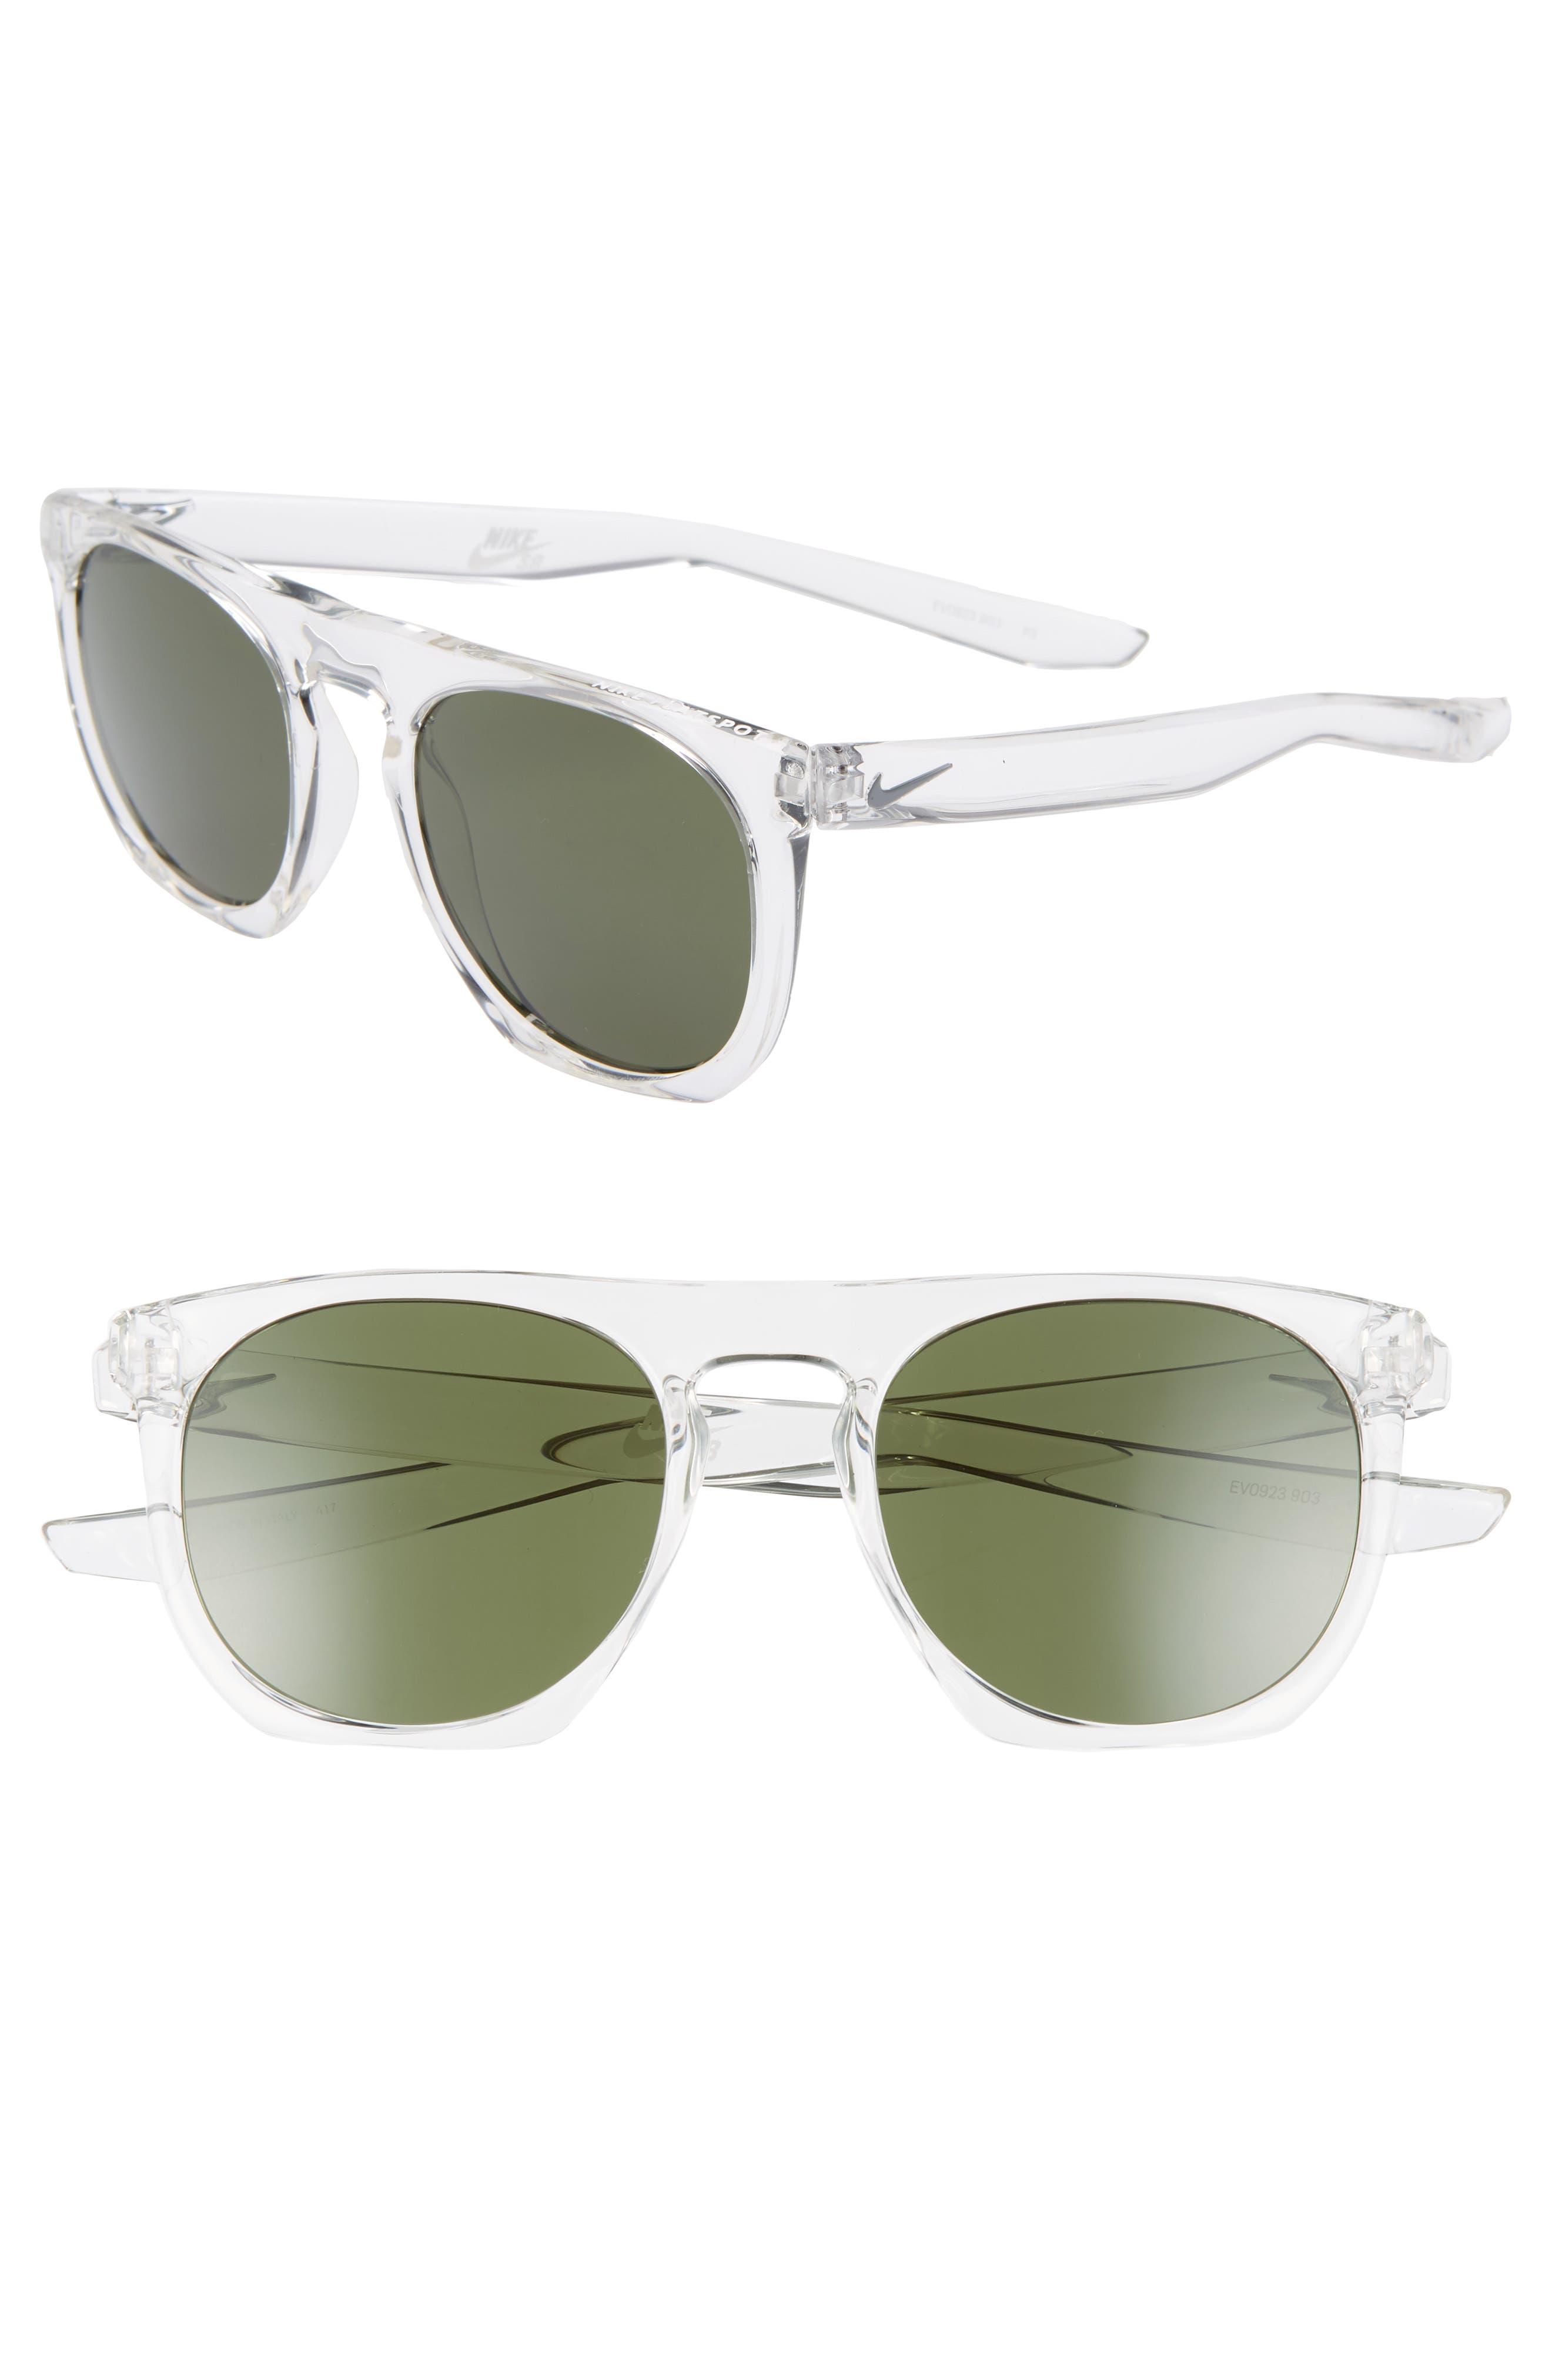 Nike Flatspot 52Mm Flat Top Sunglasses - Clear/ Green